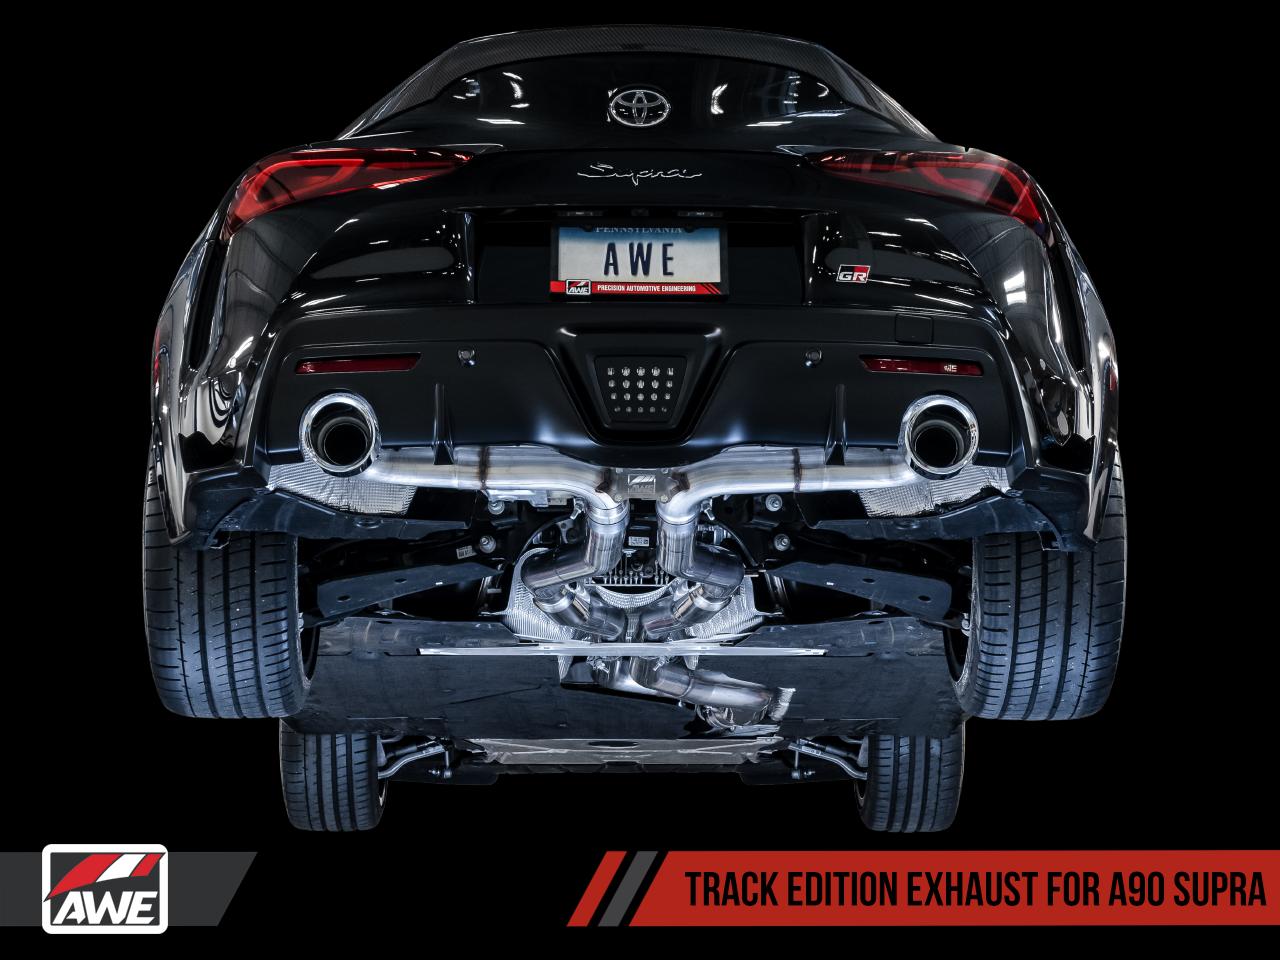 AWE Track Edition Exhaust - 2020 Supra